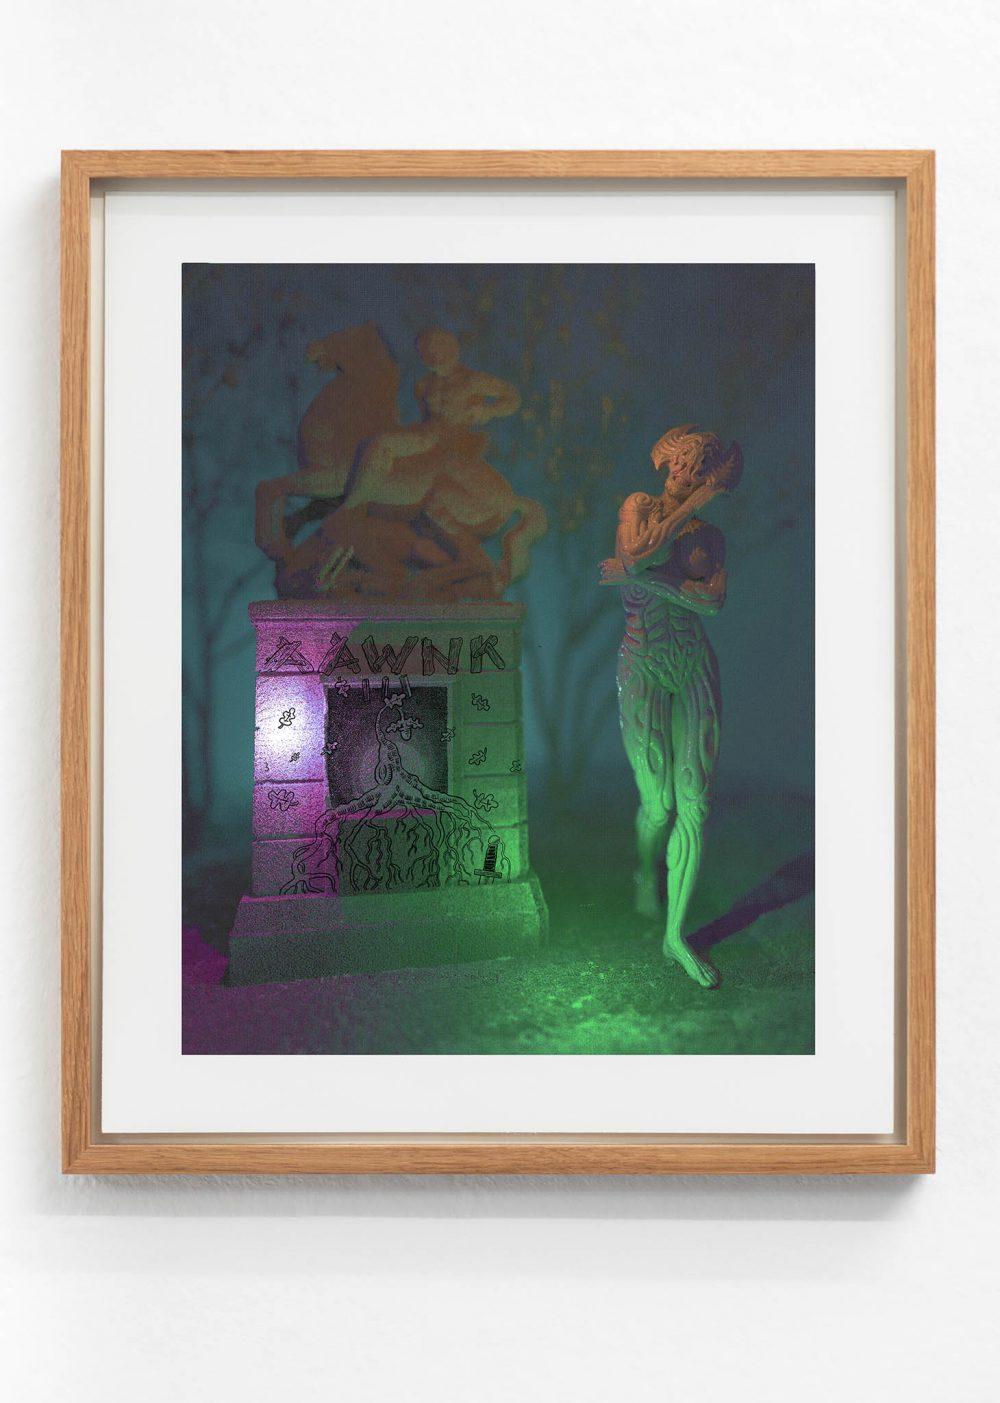 Tim Berresheim | Angst Teenage | Falko Alexander gallery